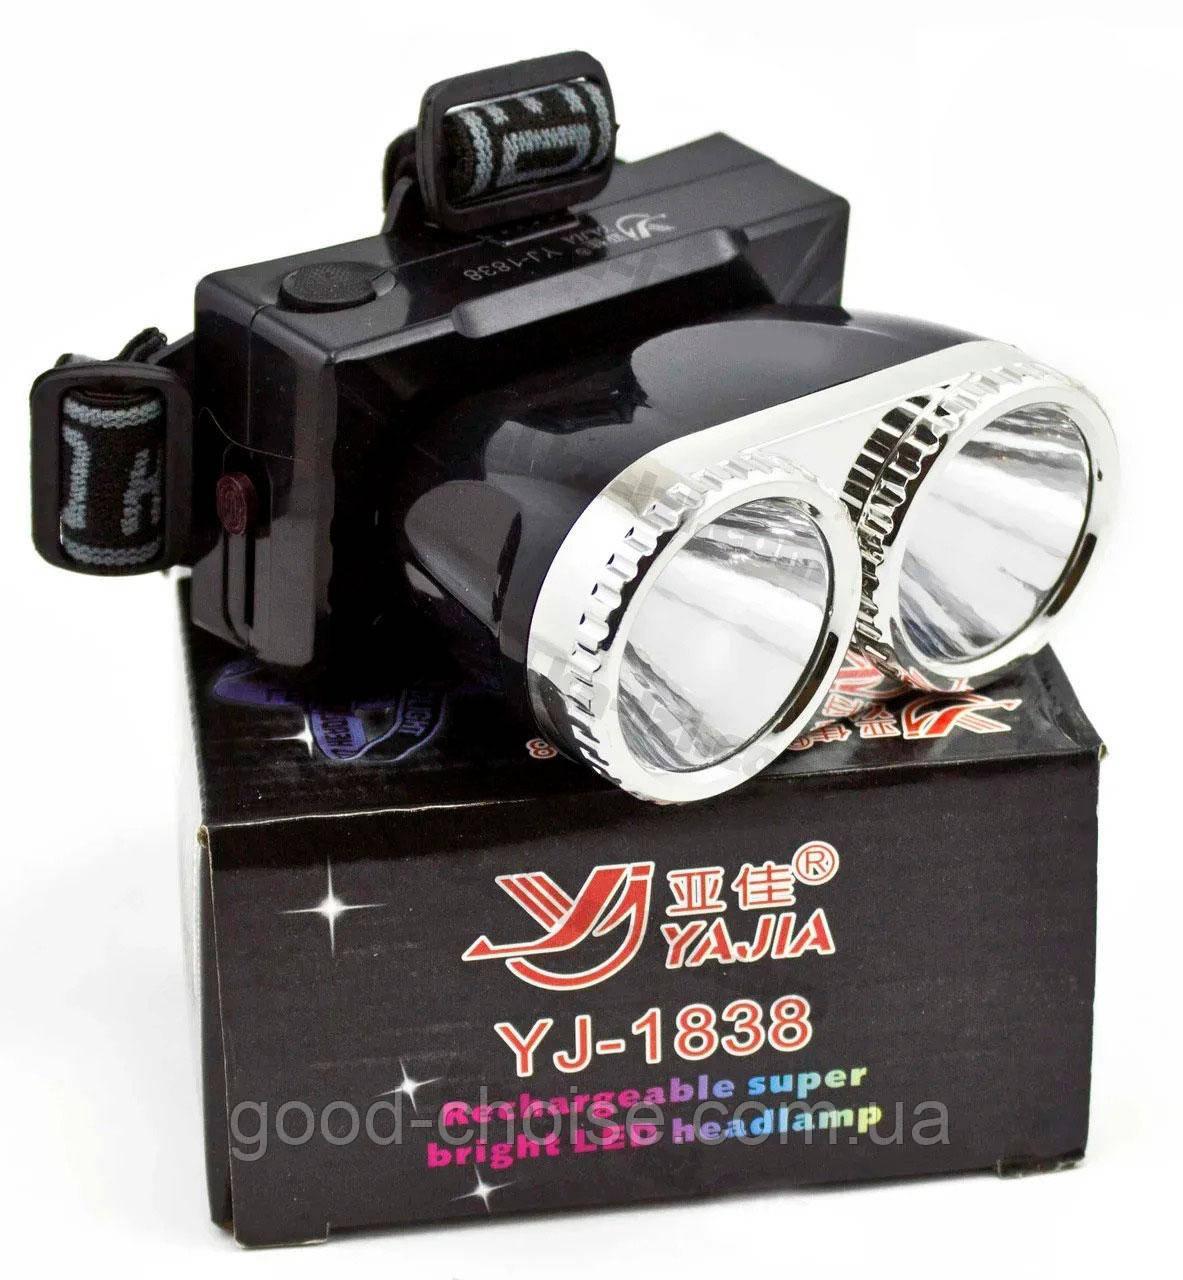 Налобный фонарь + Подарок / Yajia YJ-1838